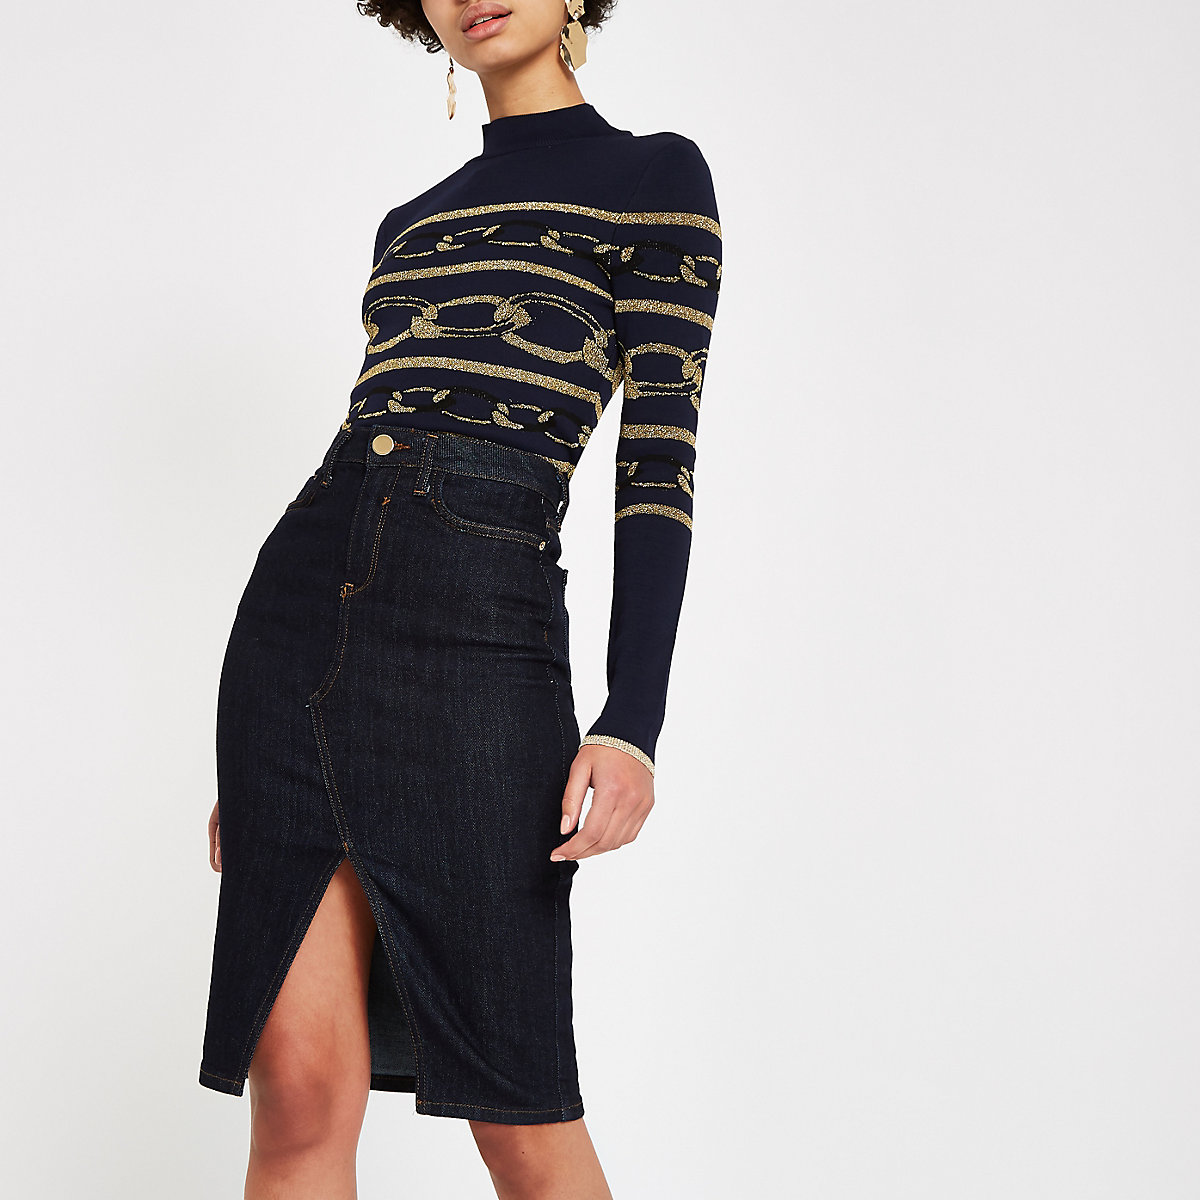 Dark blue denim pencil skirt